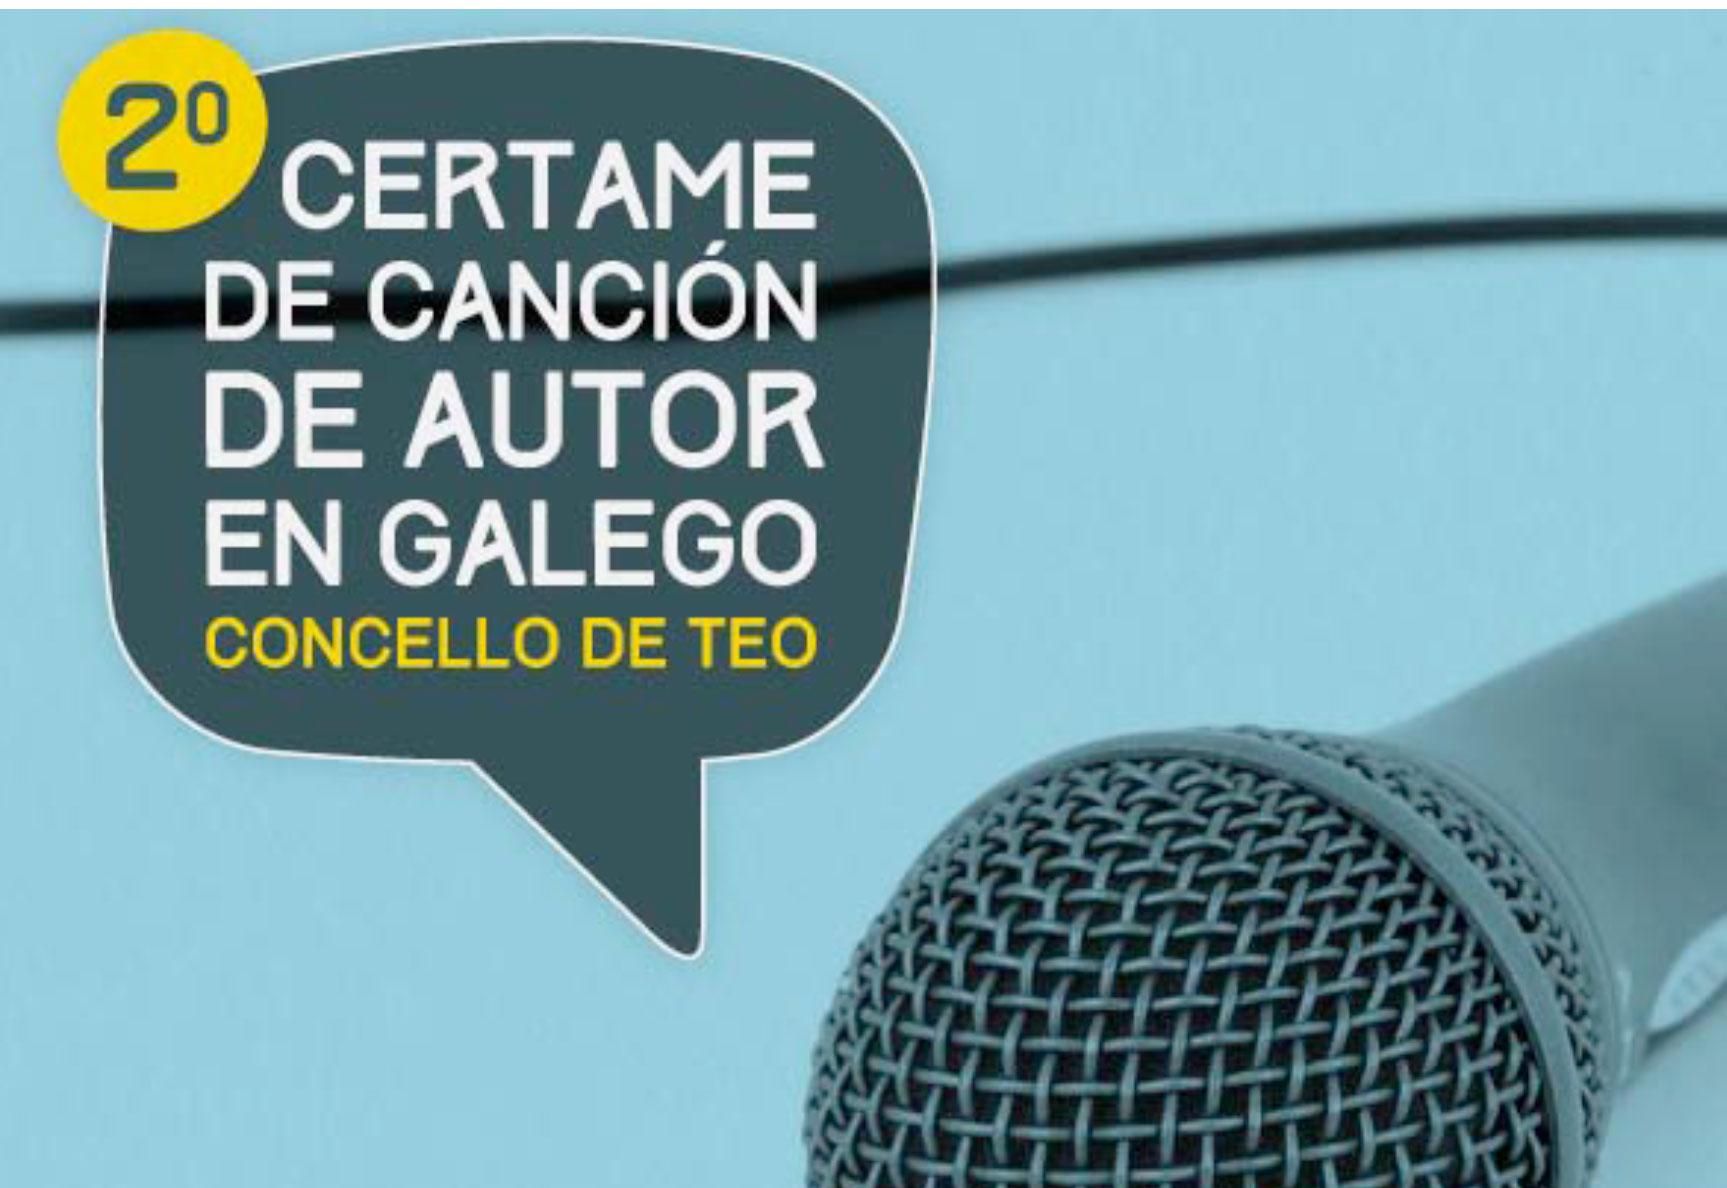 "Certame de canción de autor en galego ""Concello de Teo"""